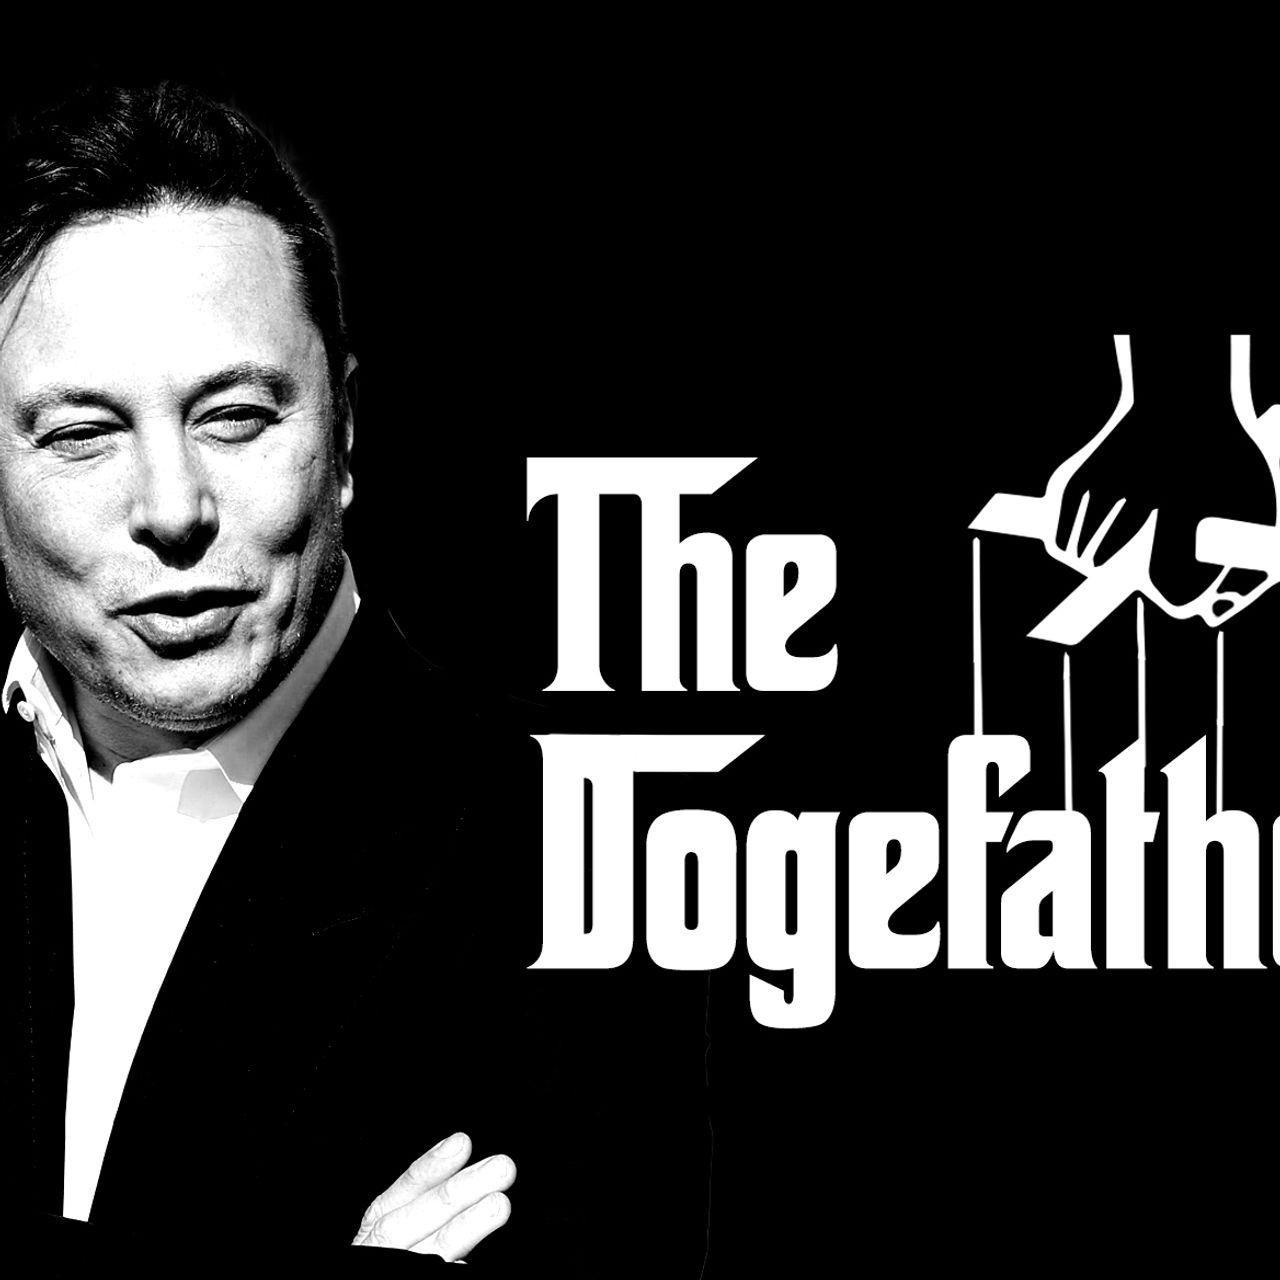 Elon Musk dubs himself 'The Dogefather' in SNL promo tweet ...